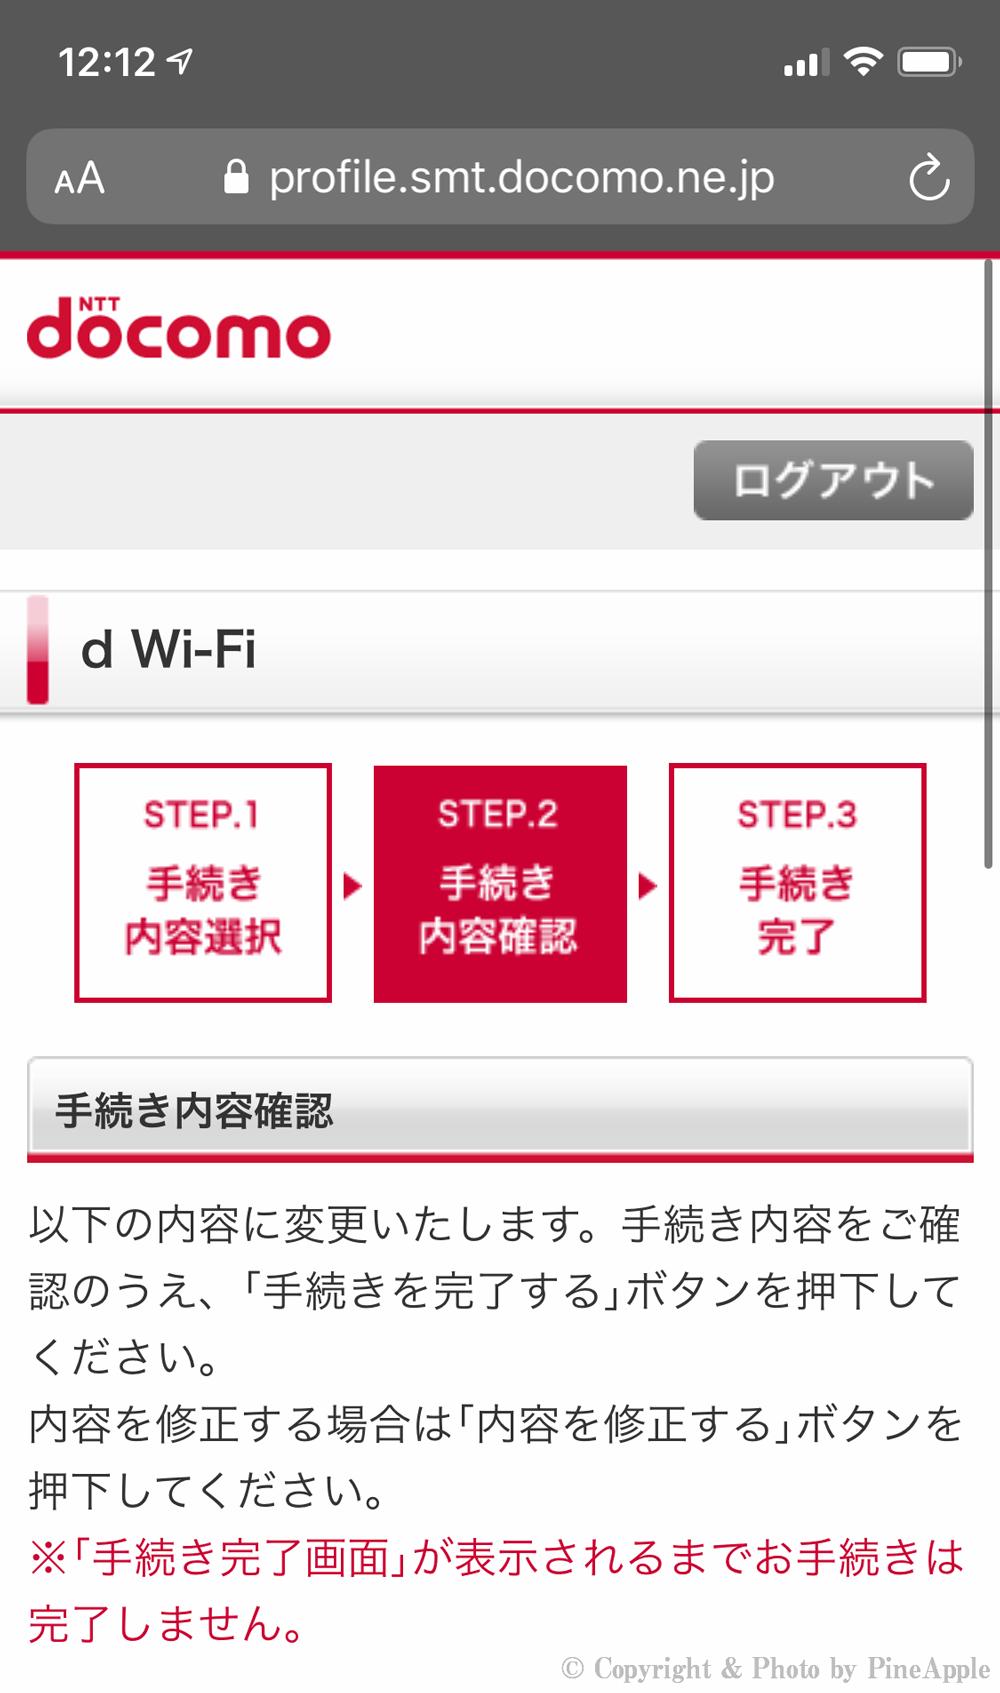 d Wi-Fi:「手続き内容」を確認